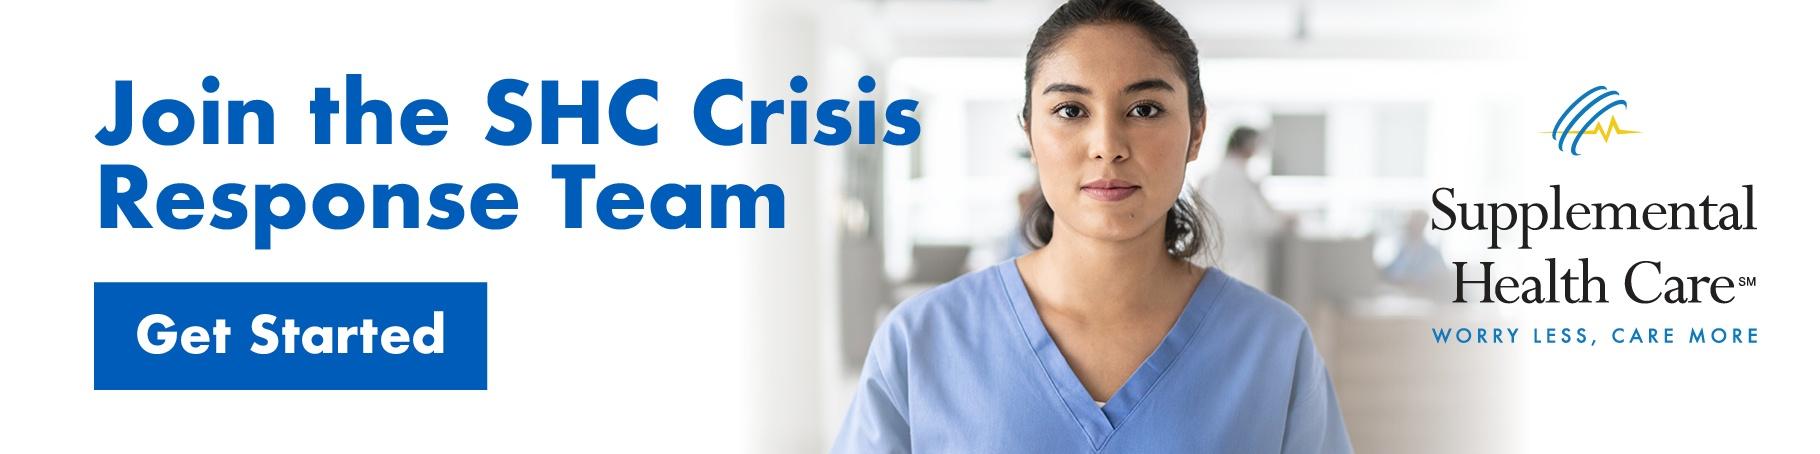 travel nursing nurse crisis needs covid-19